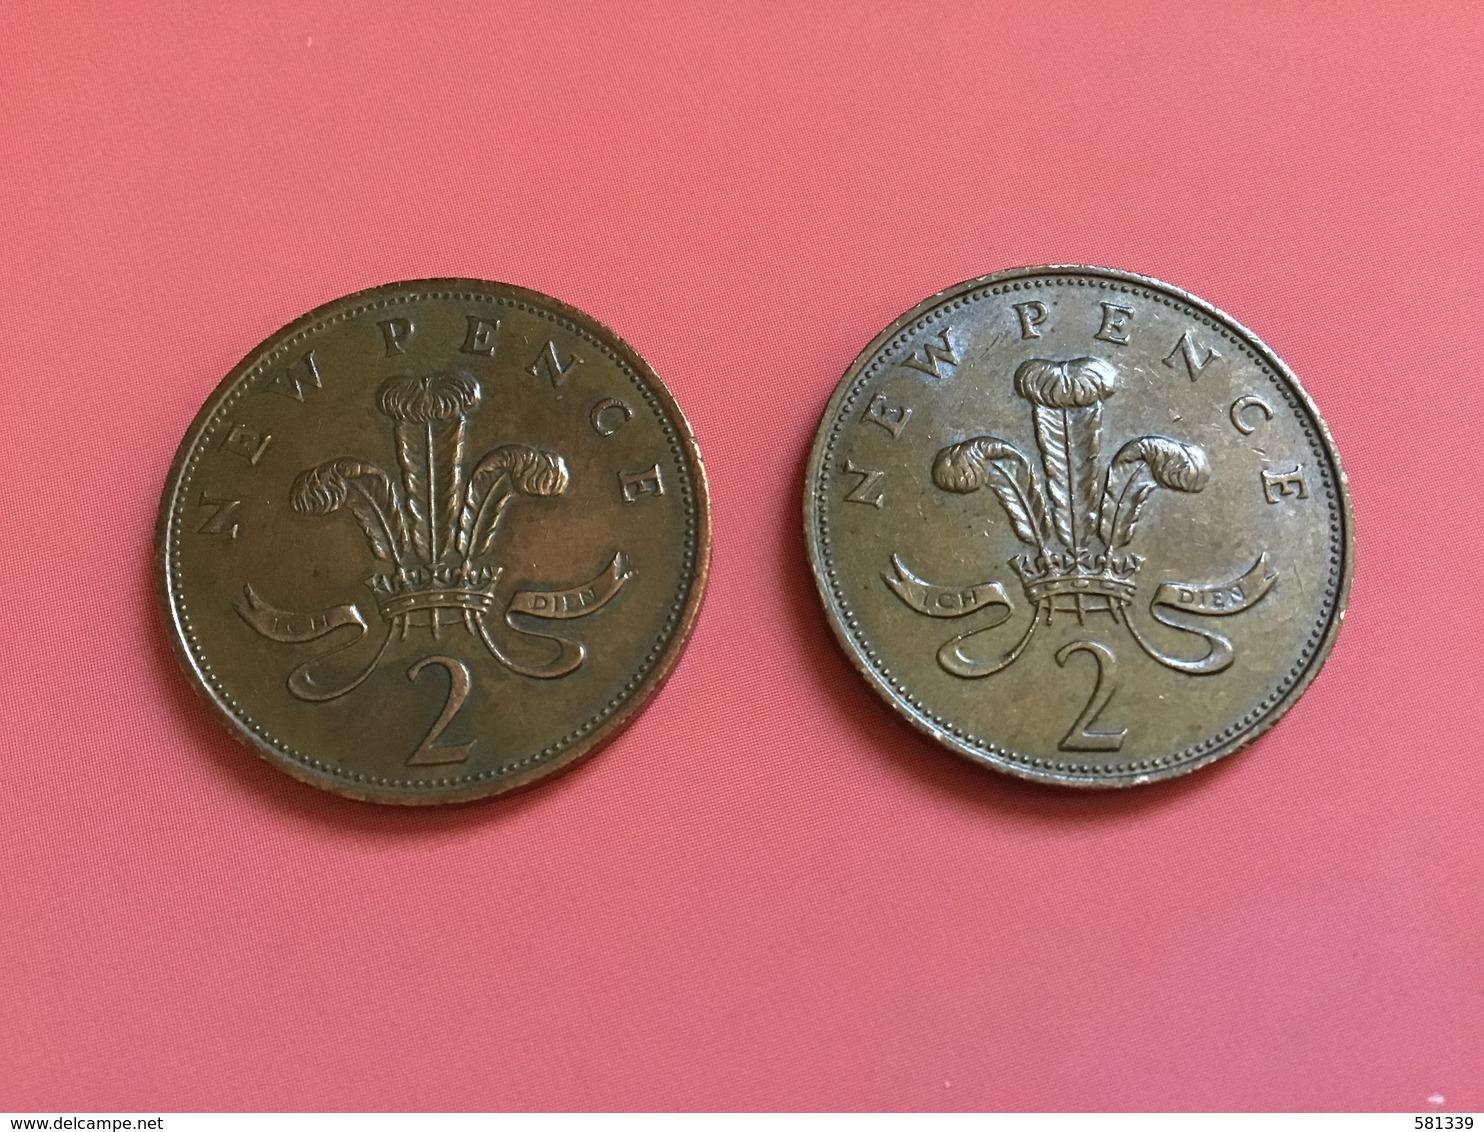 INGHILTERRA - ENGLAND  - 1971 - 1981 - 2 Monete Da  2 NEW PENCE - 1971-… : Monete Decimali